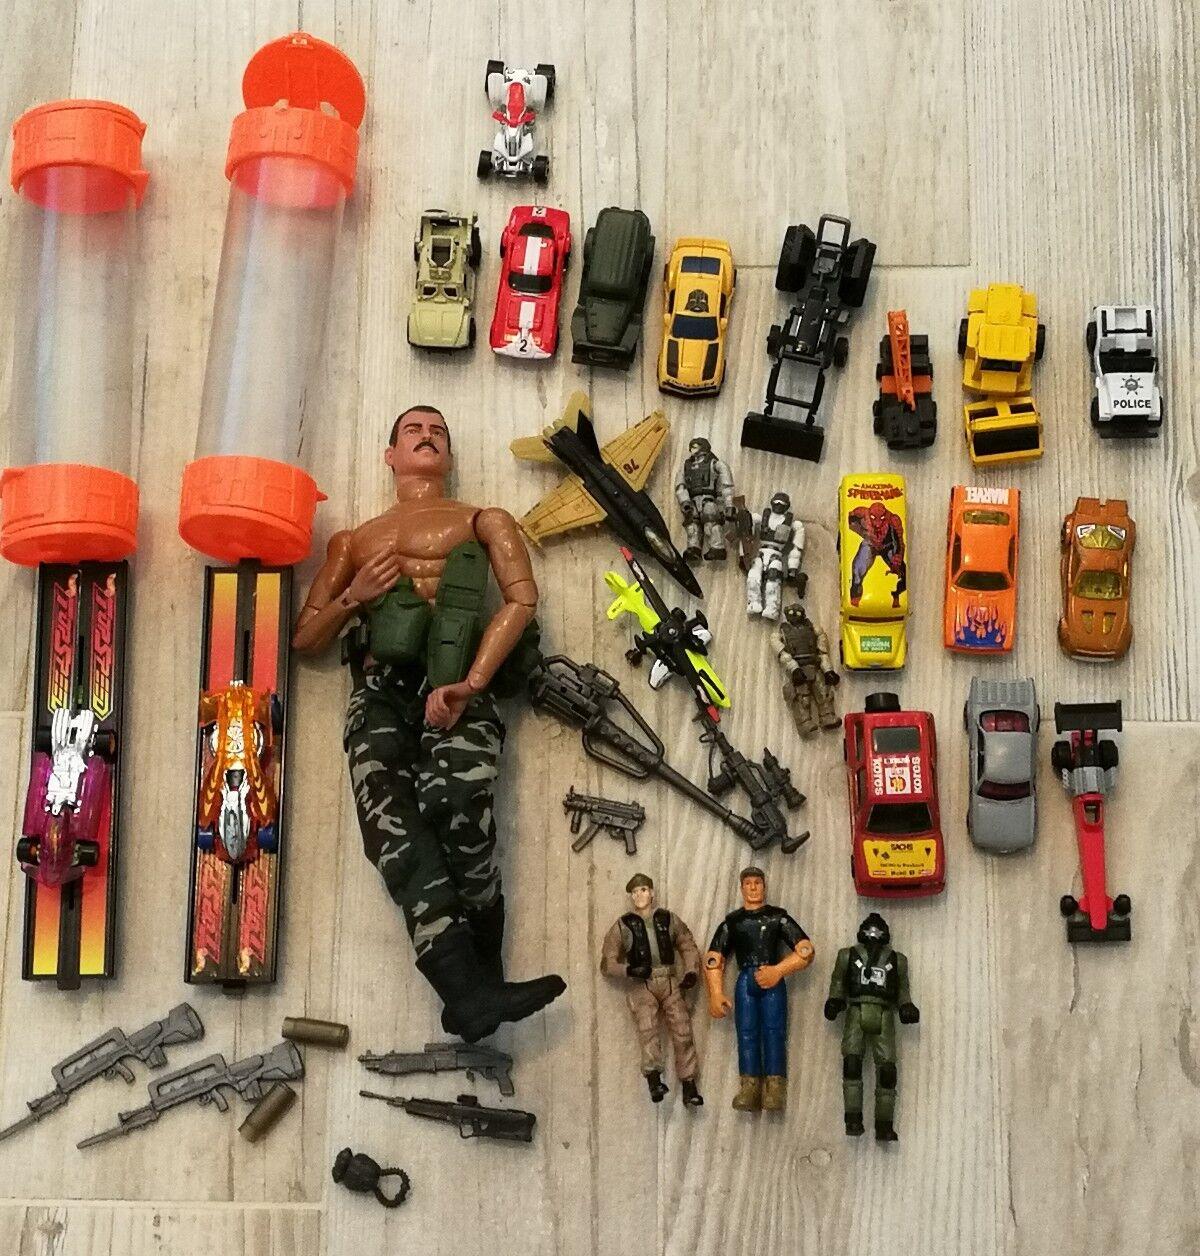 Junk Drawer Lot Top Speed Hot Wheels Match Box GI Joe Diecast Marvel VTG Halo